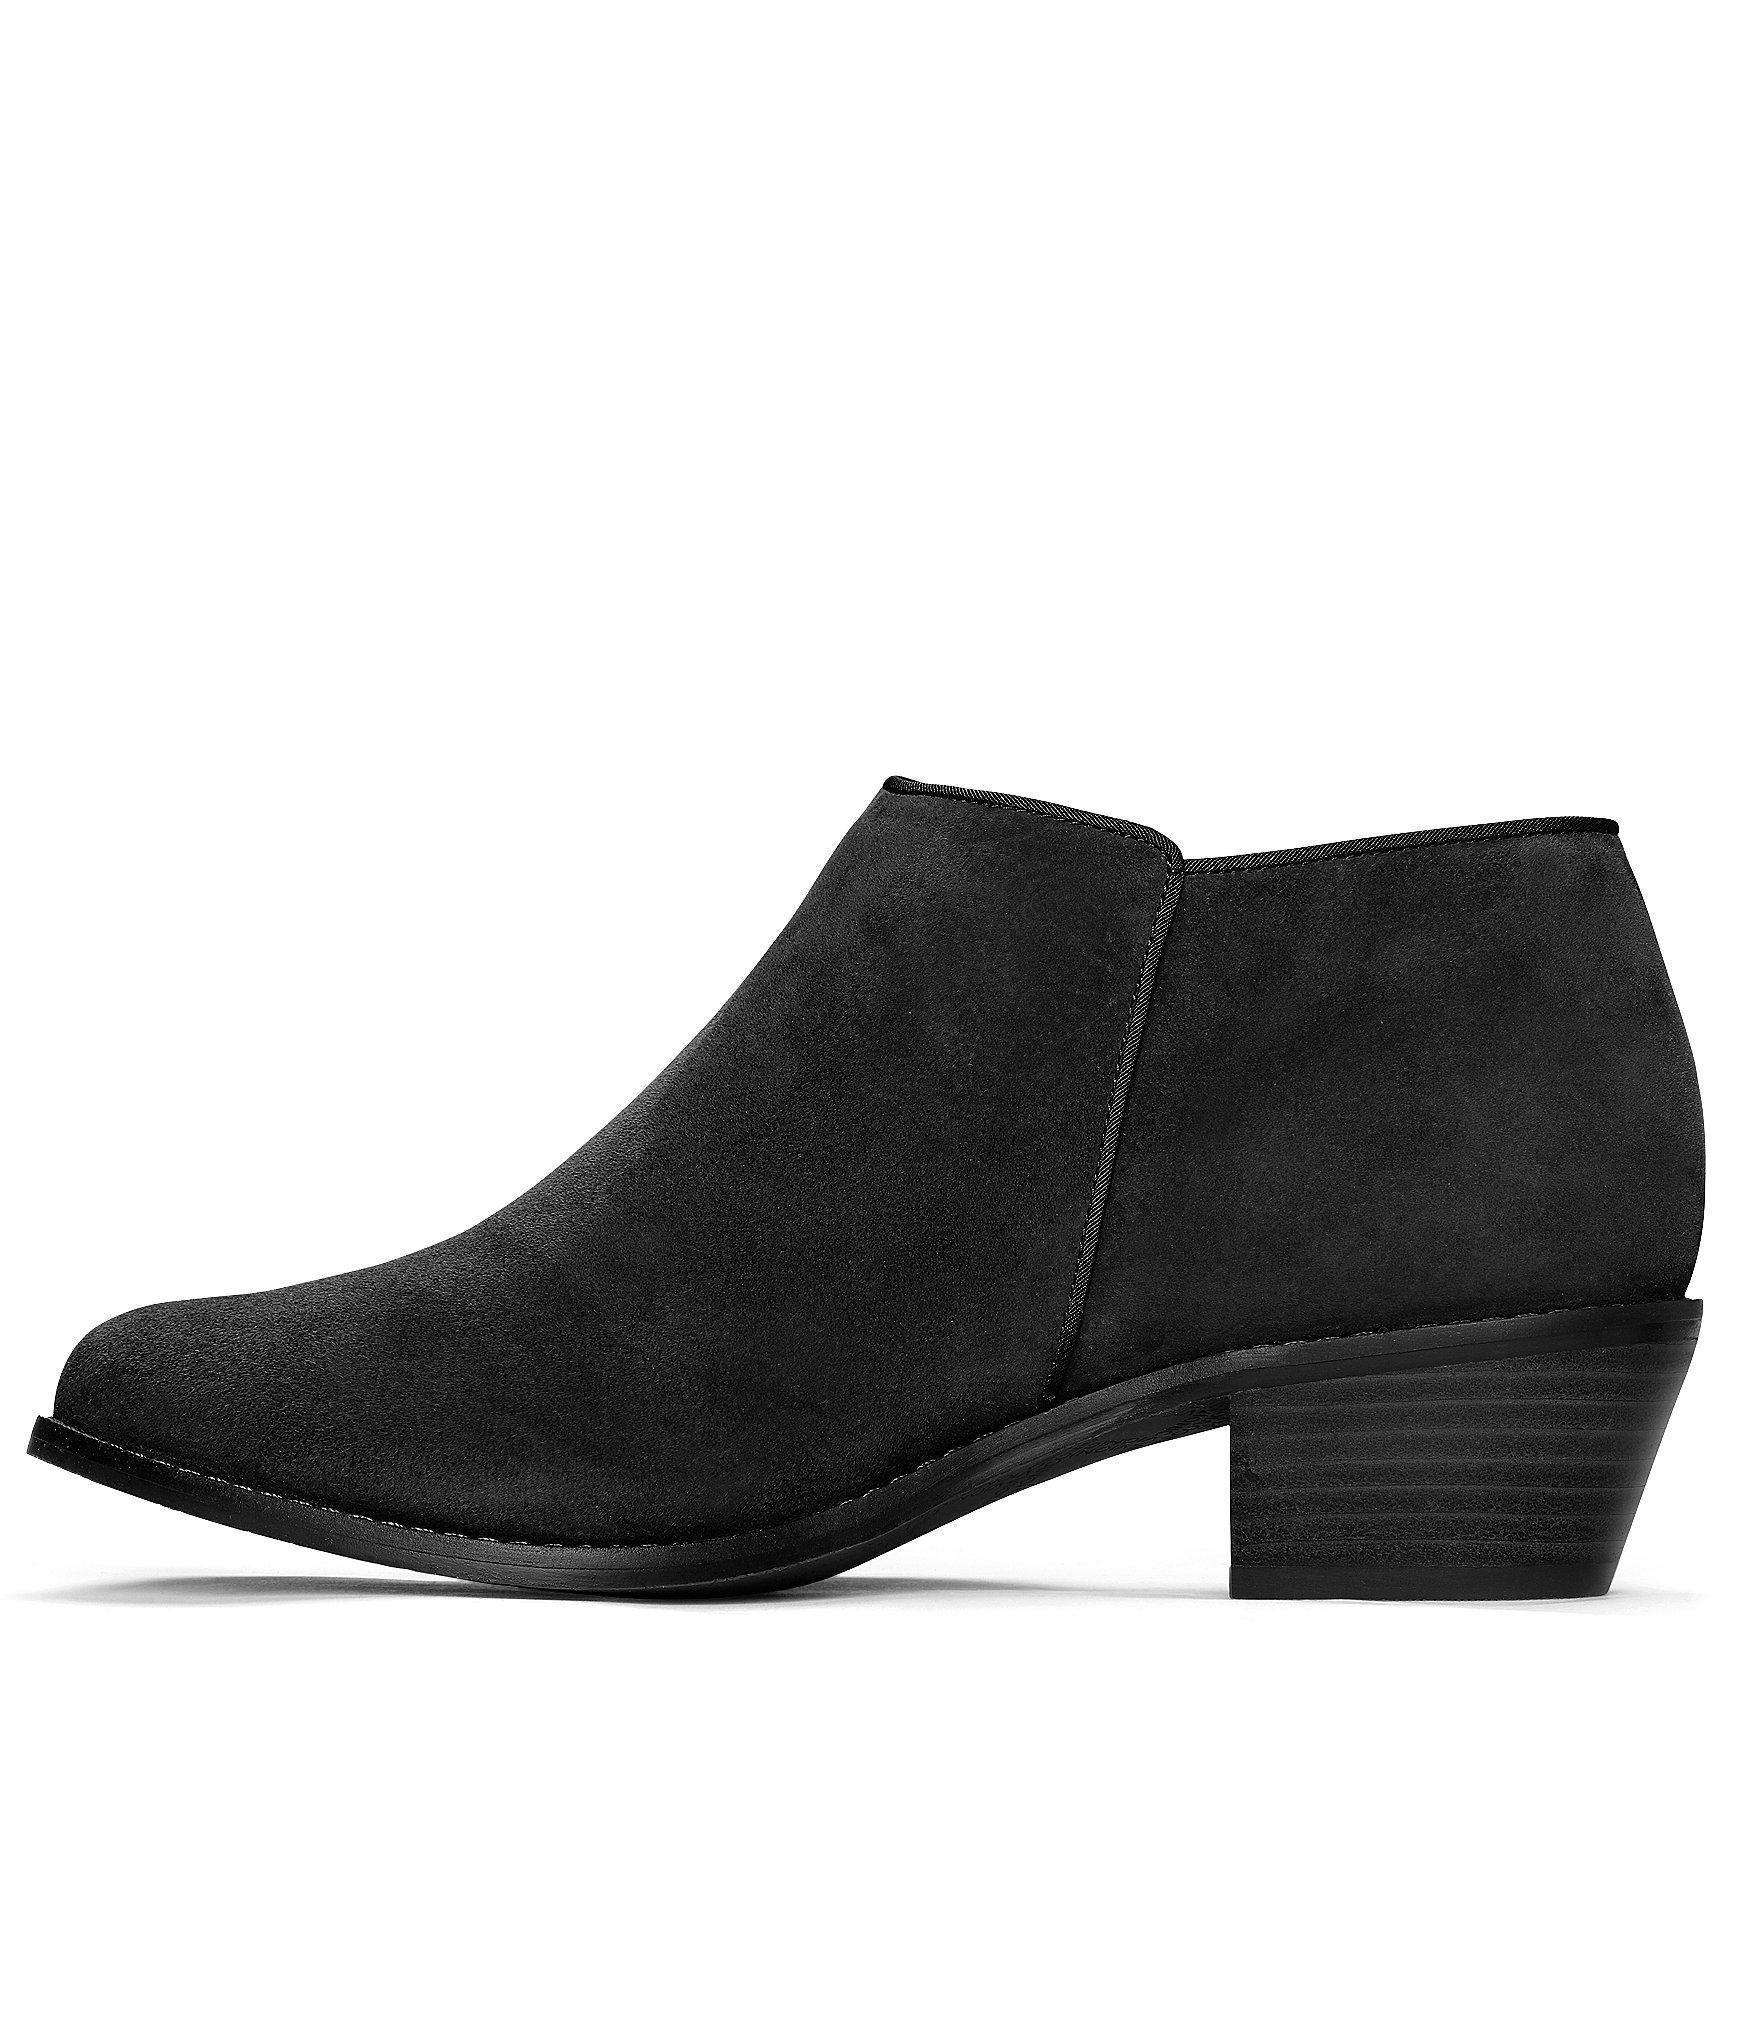 f8b6f7fd9f3bc Vionic - Black Serena Water Resistant Suede Zipper With Tassel Pull Block  Heel Ankle Boots -. View fullscreen